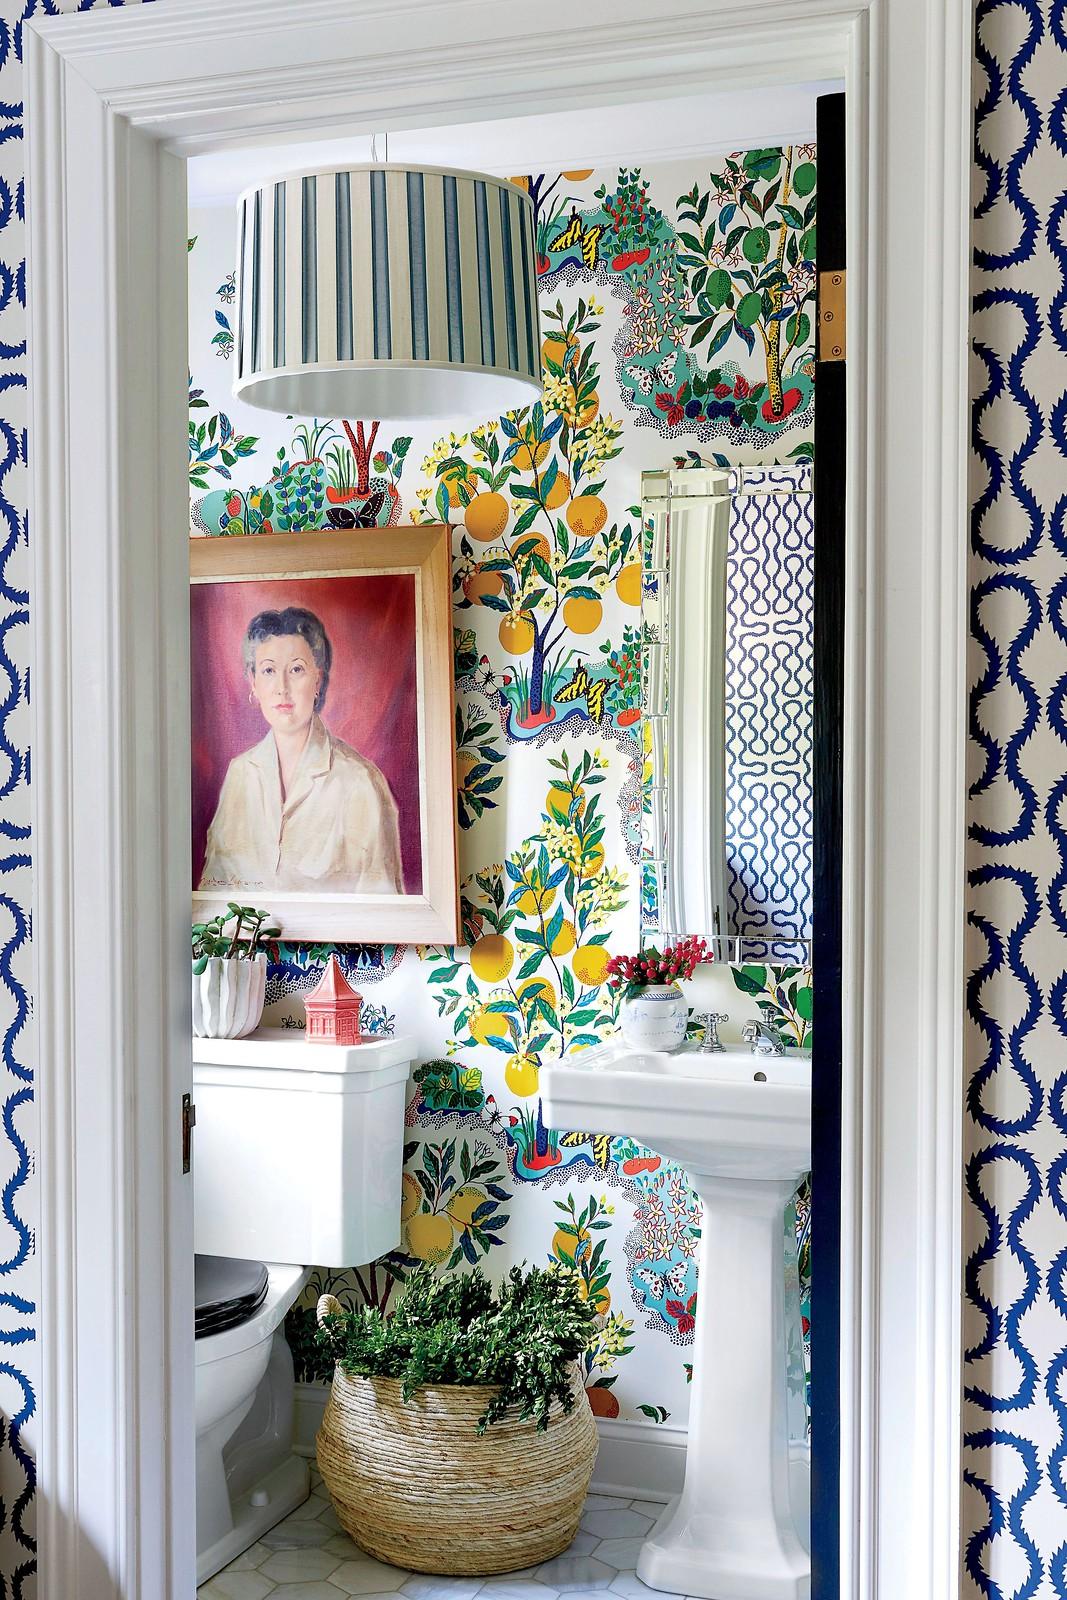 Colorful Bathroom Inspiration | Bold Wallpapered Bathroom | Lemon Fruit Wallpaper | Greenery Wallpaper | Vibrant Bathroom Decor